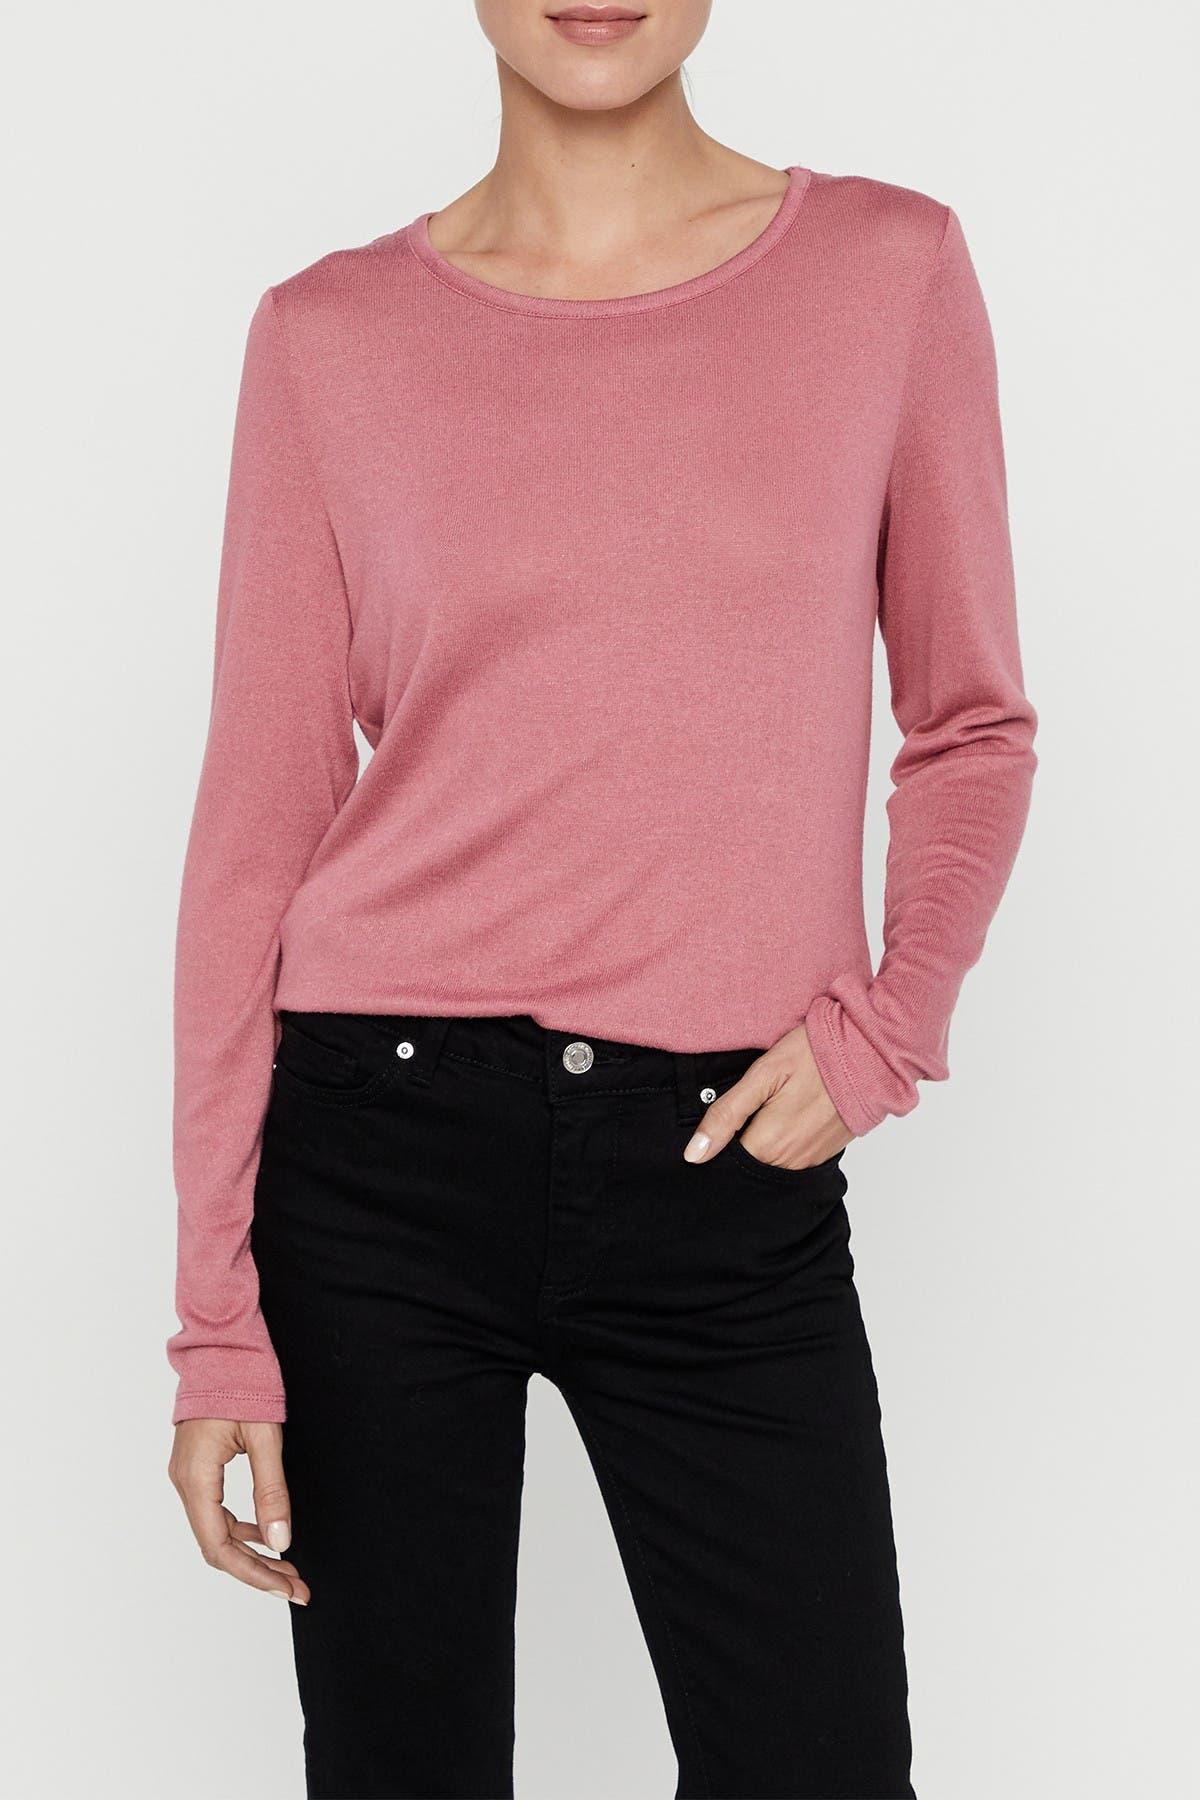 Image of VERO MODA Long Sleeve Lace Back Top